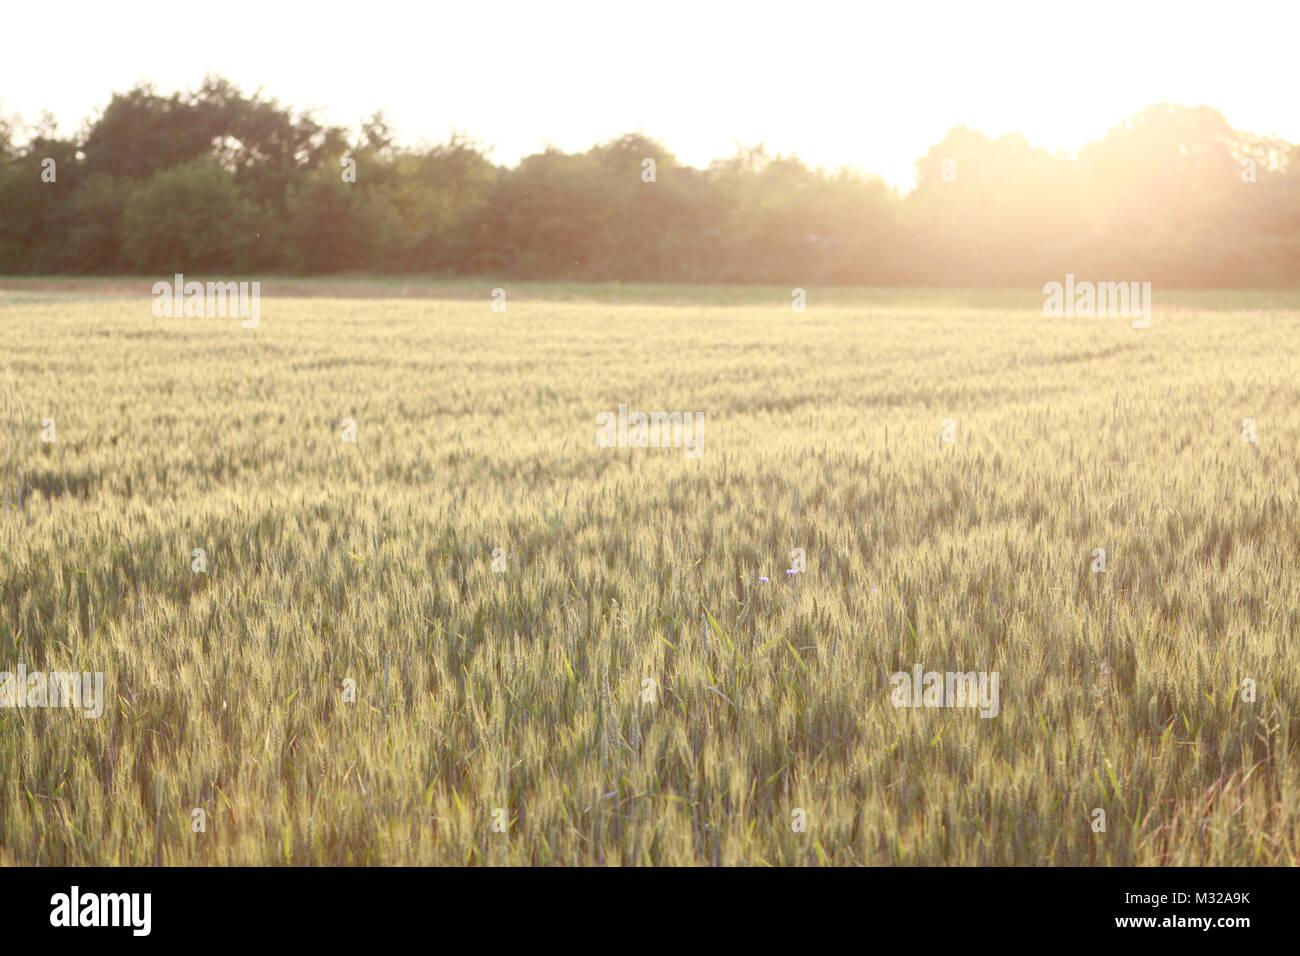 Wheat field - Stock Image